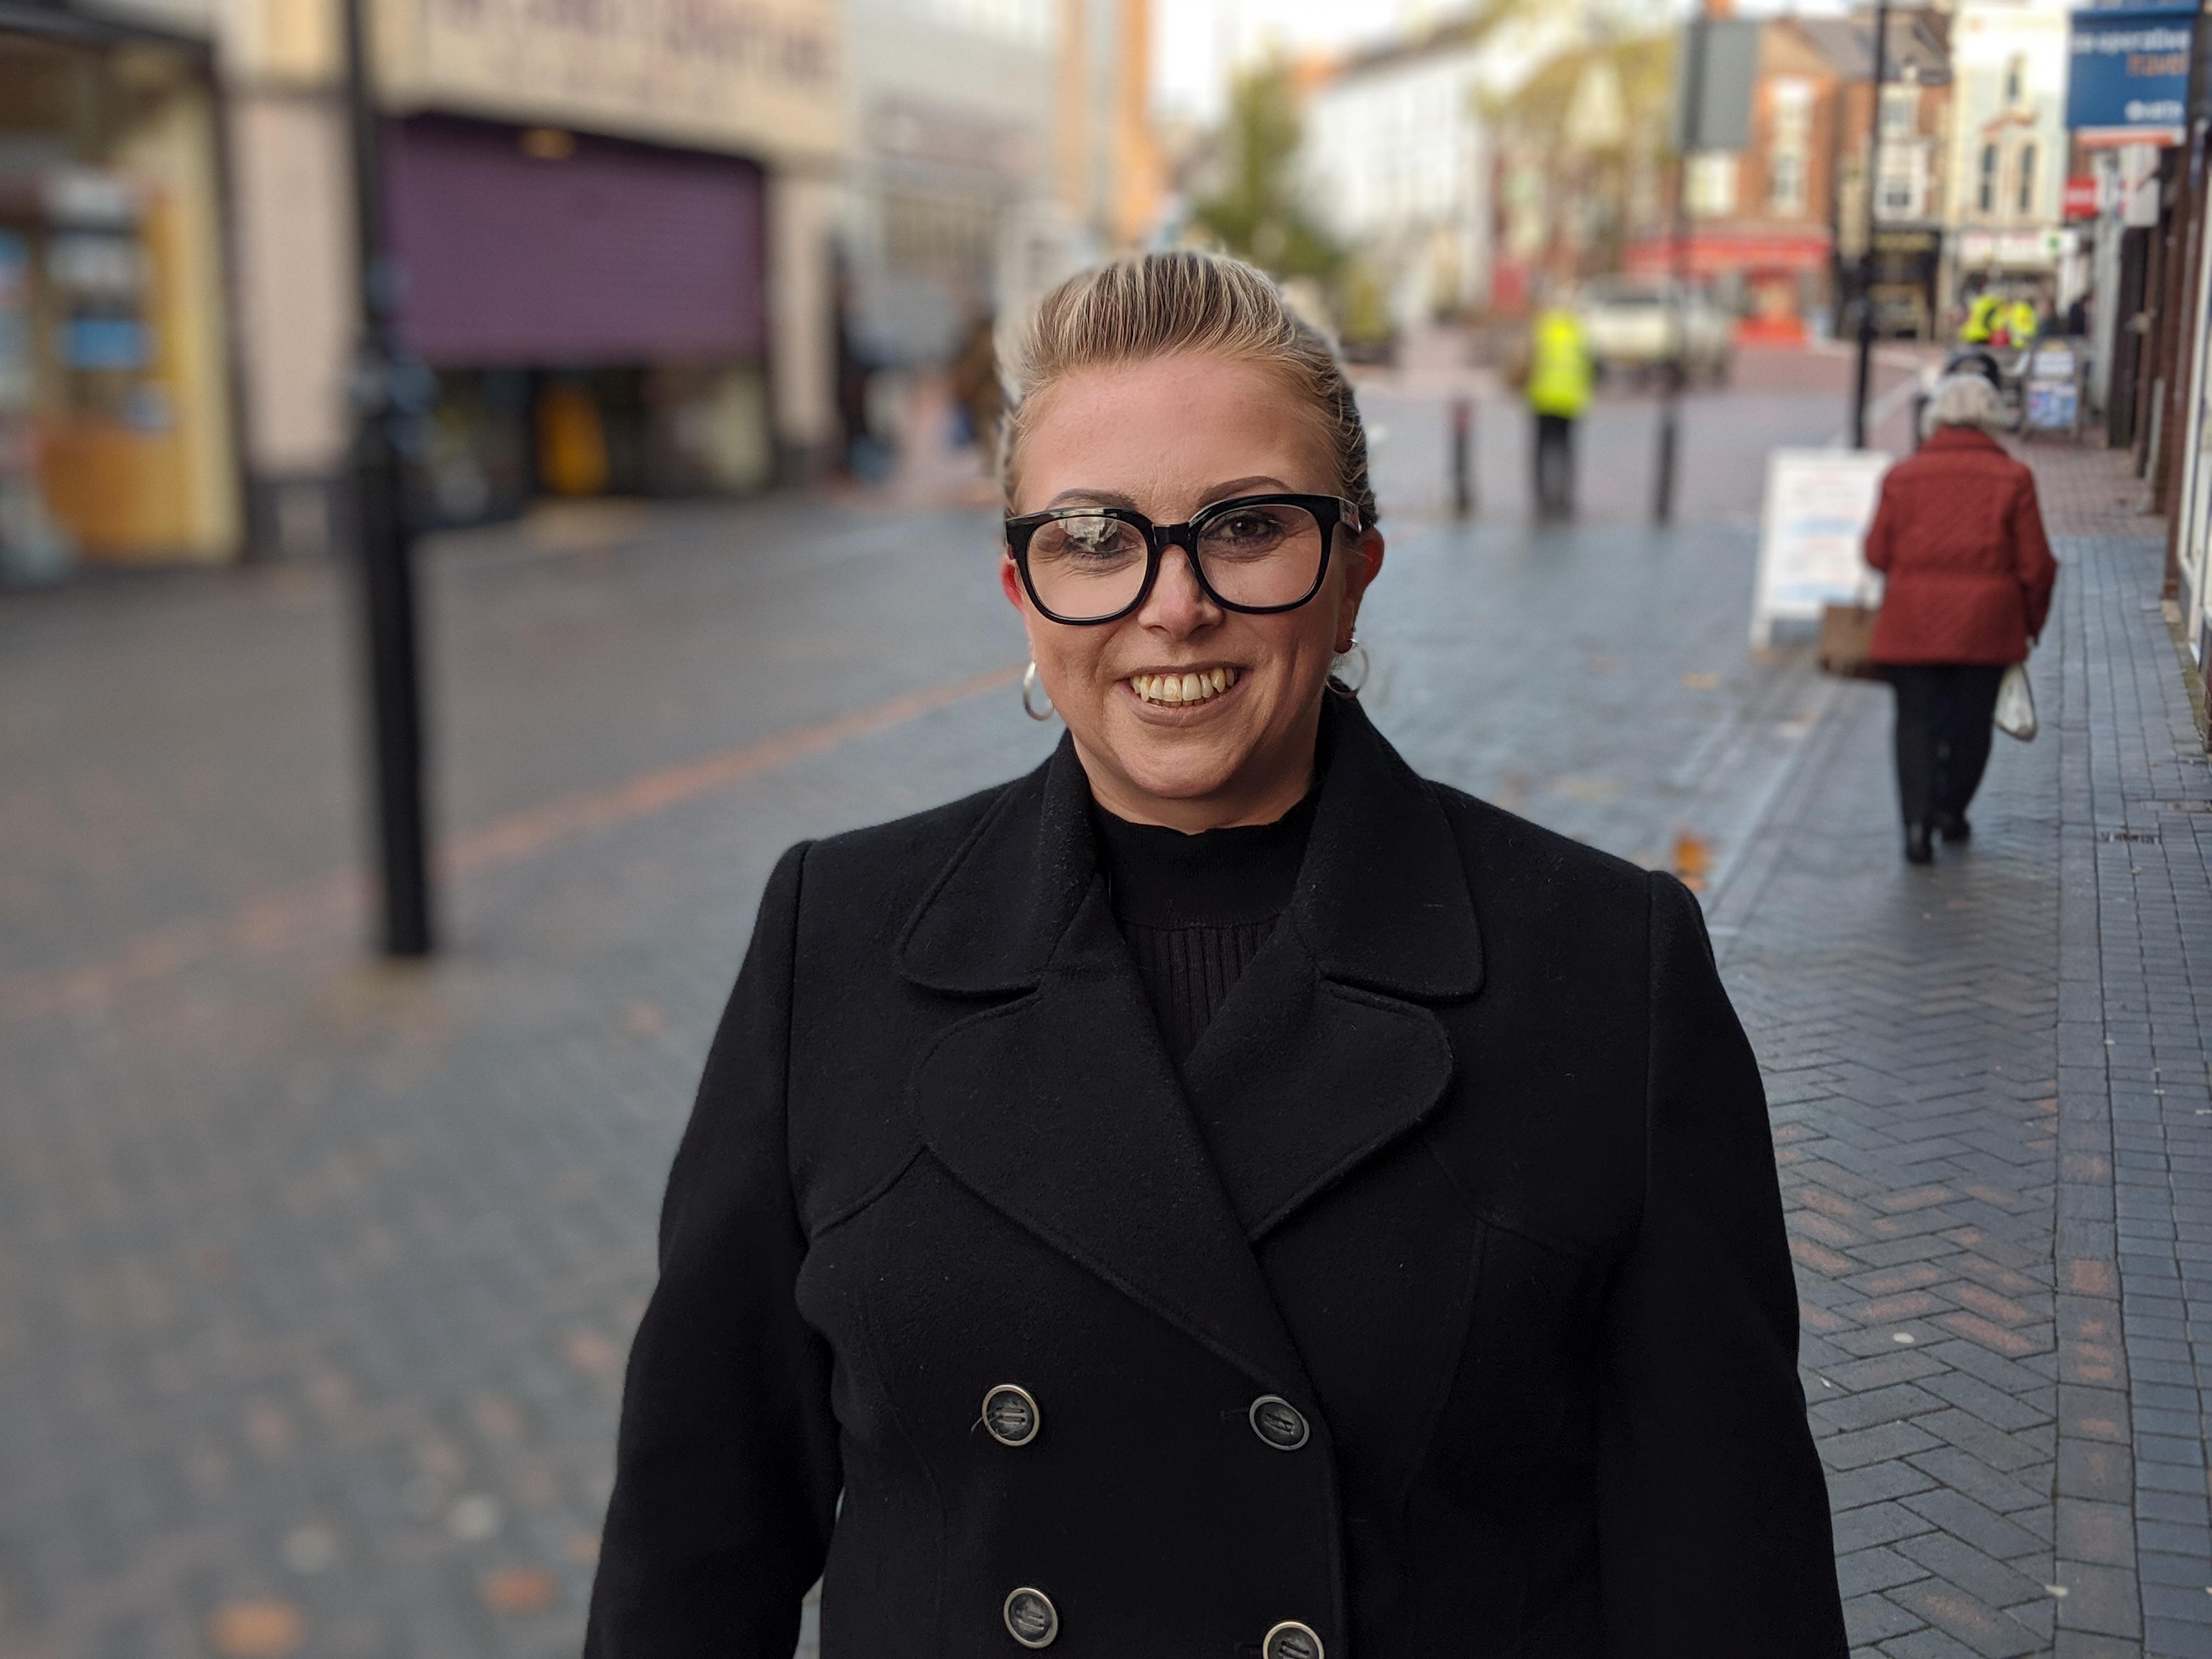 Danielle Robbins in Wednesbury